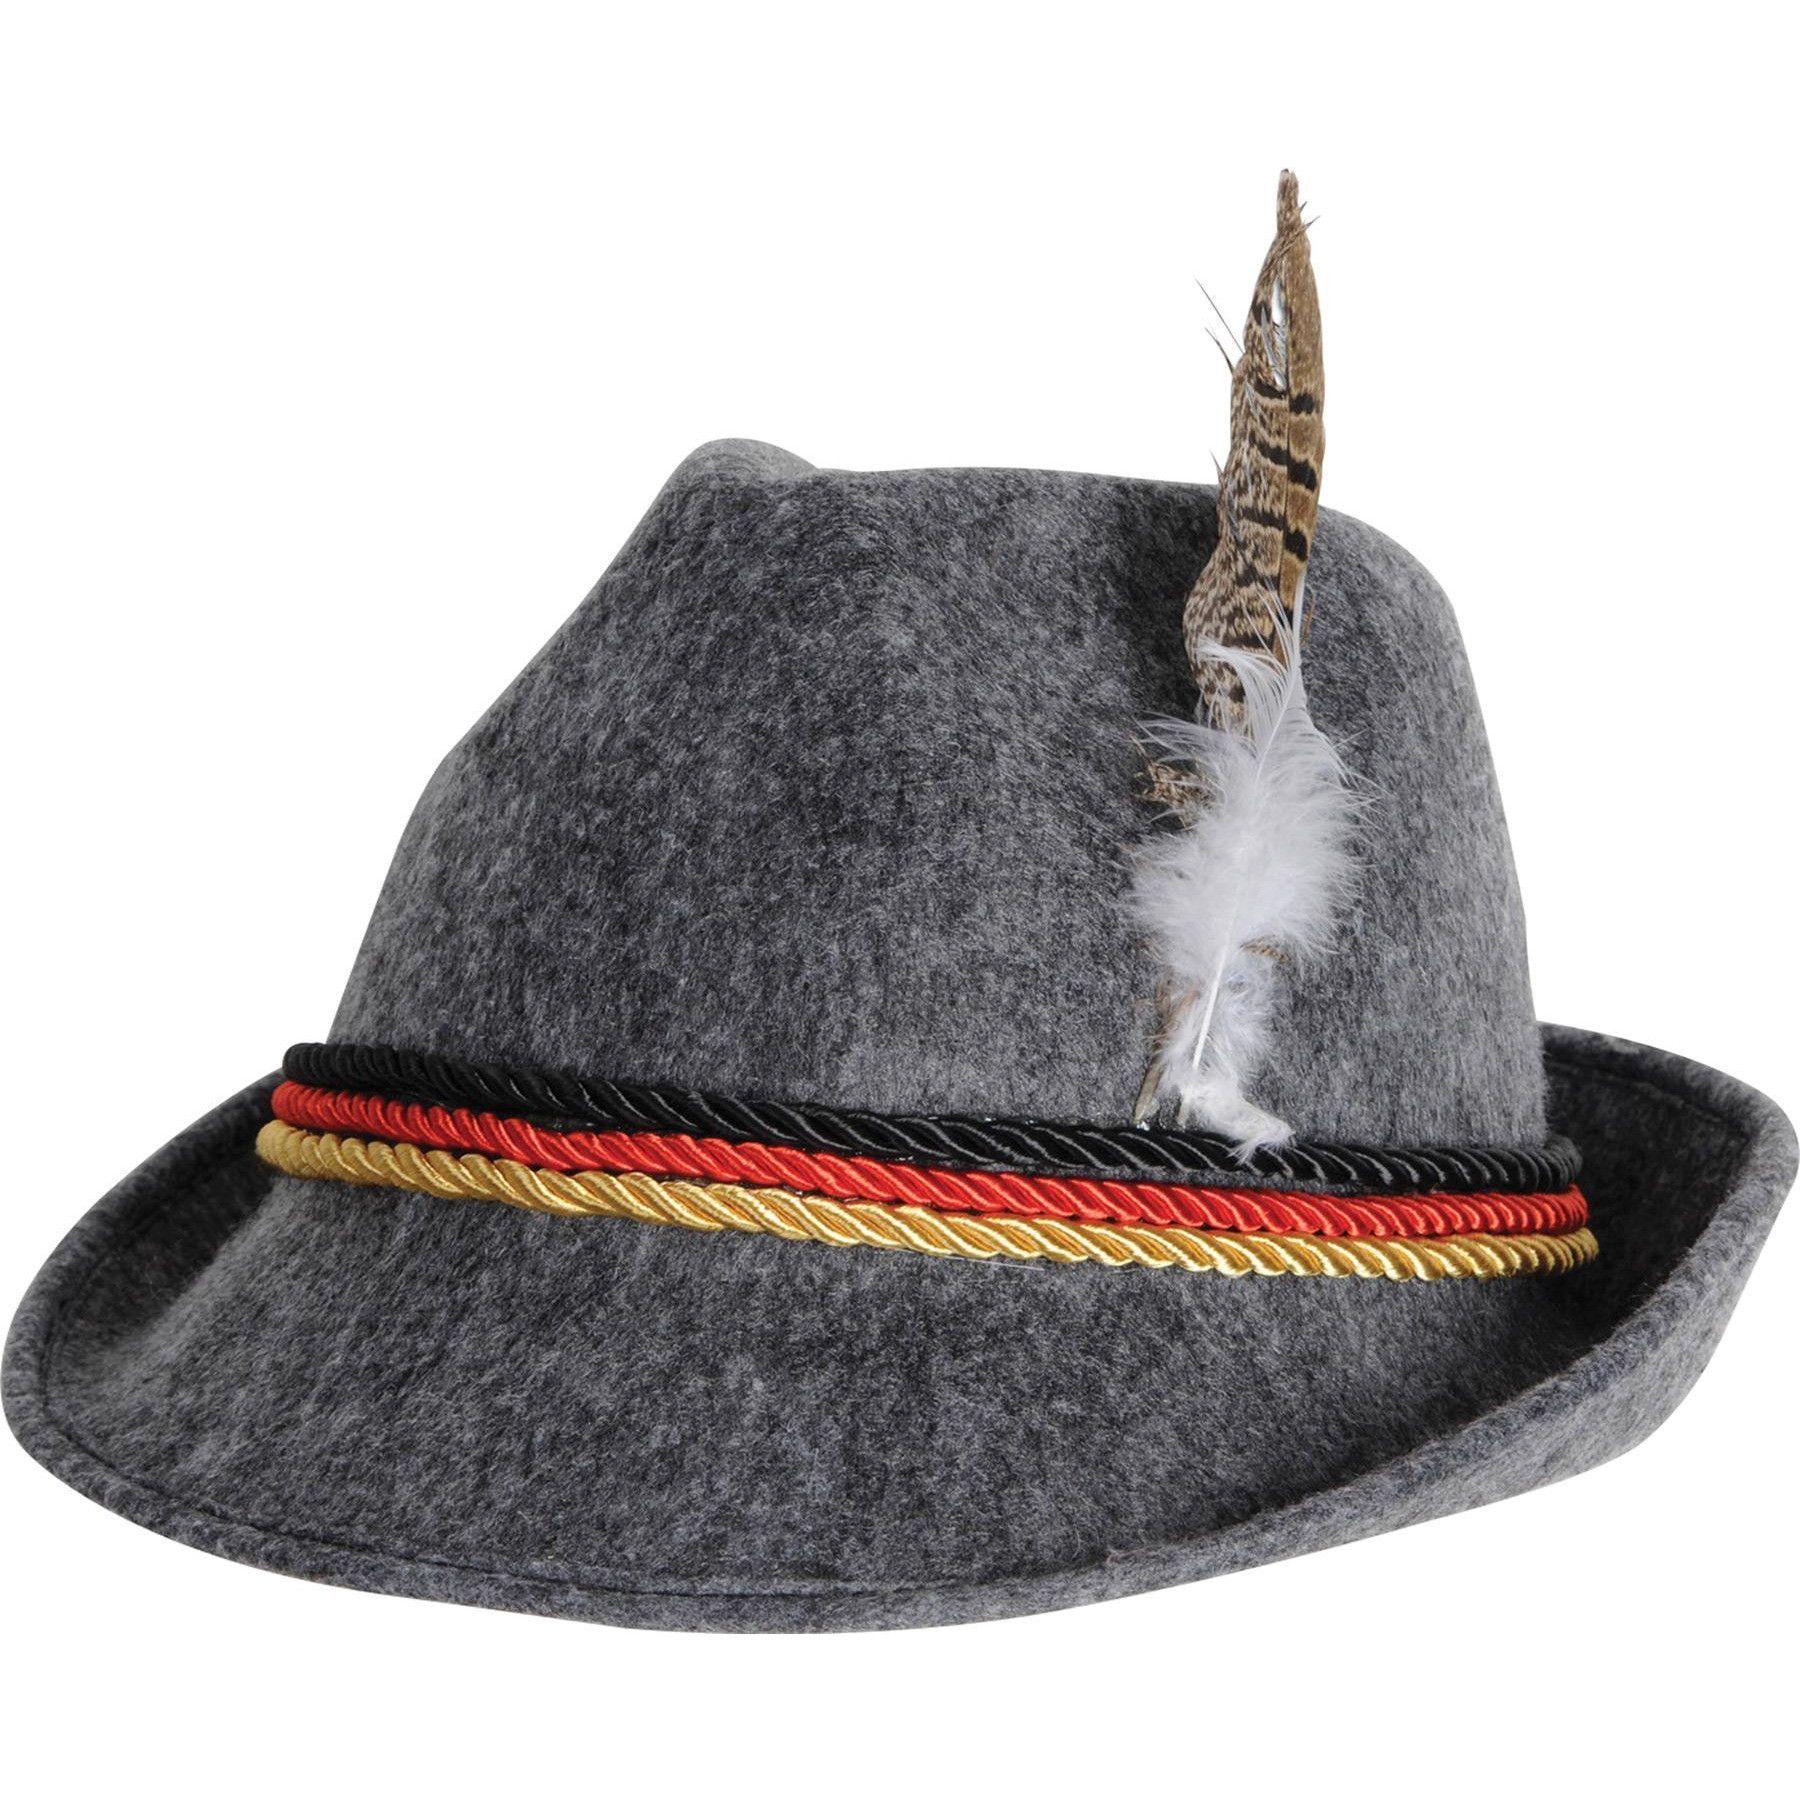 b215f05c578ba9 German Alpine Hat Lederhosen Costume, German Oktoberfest, Oktoberfest Beer,  Oktoberfest Party Costume,